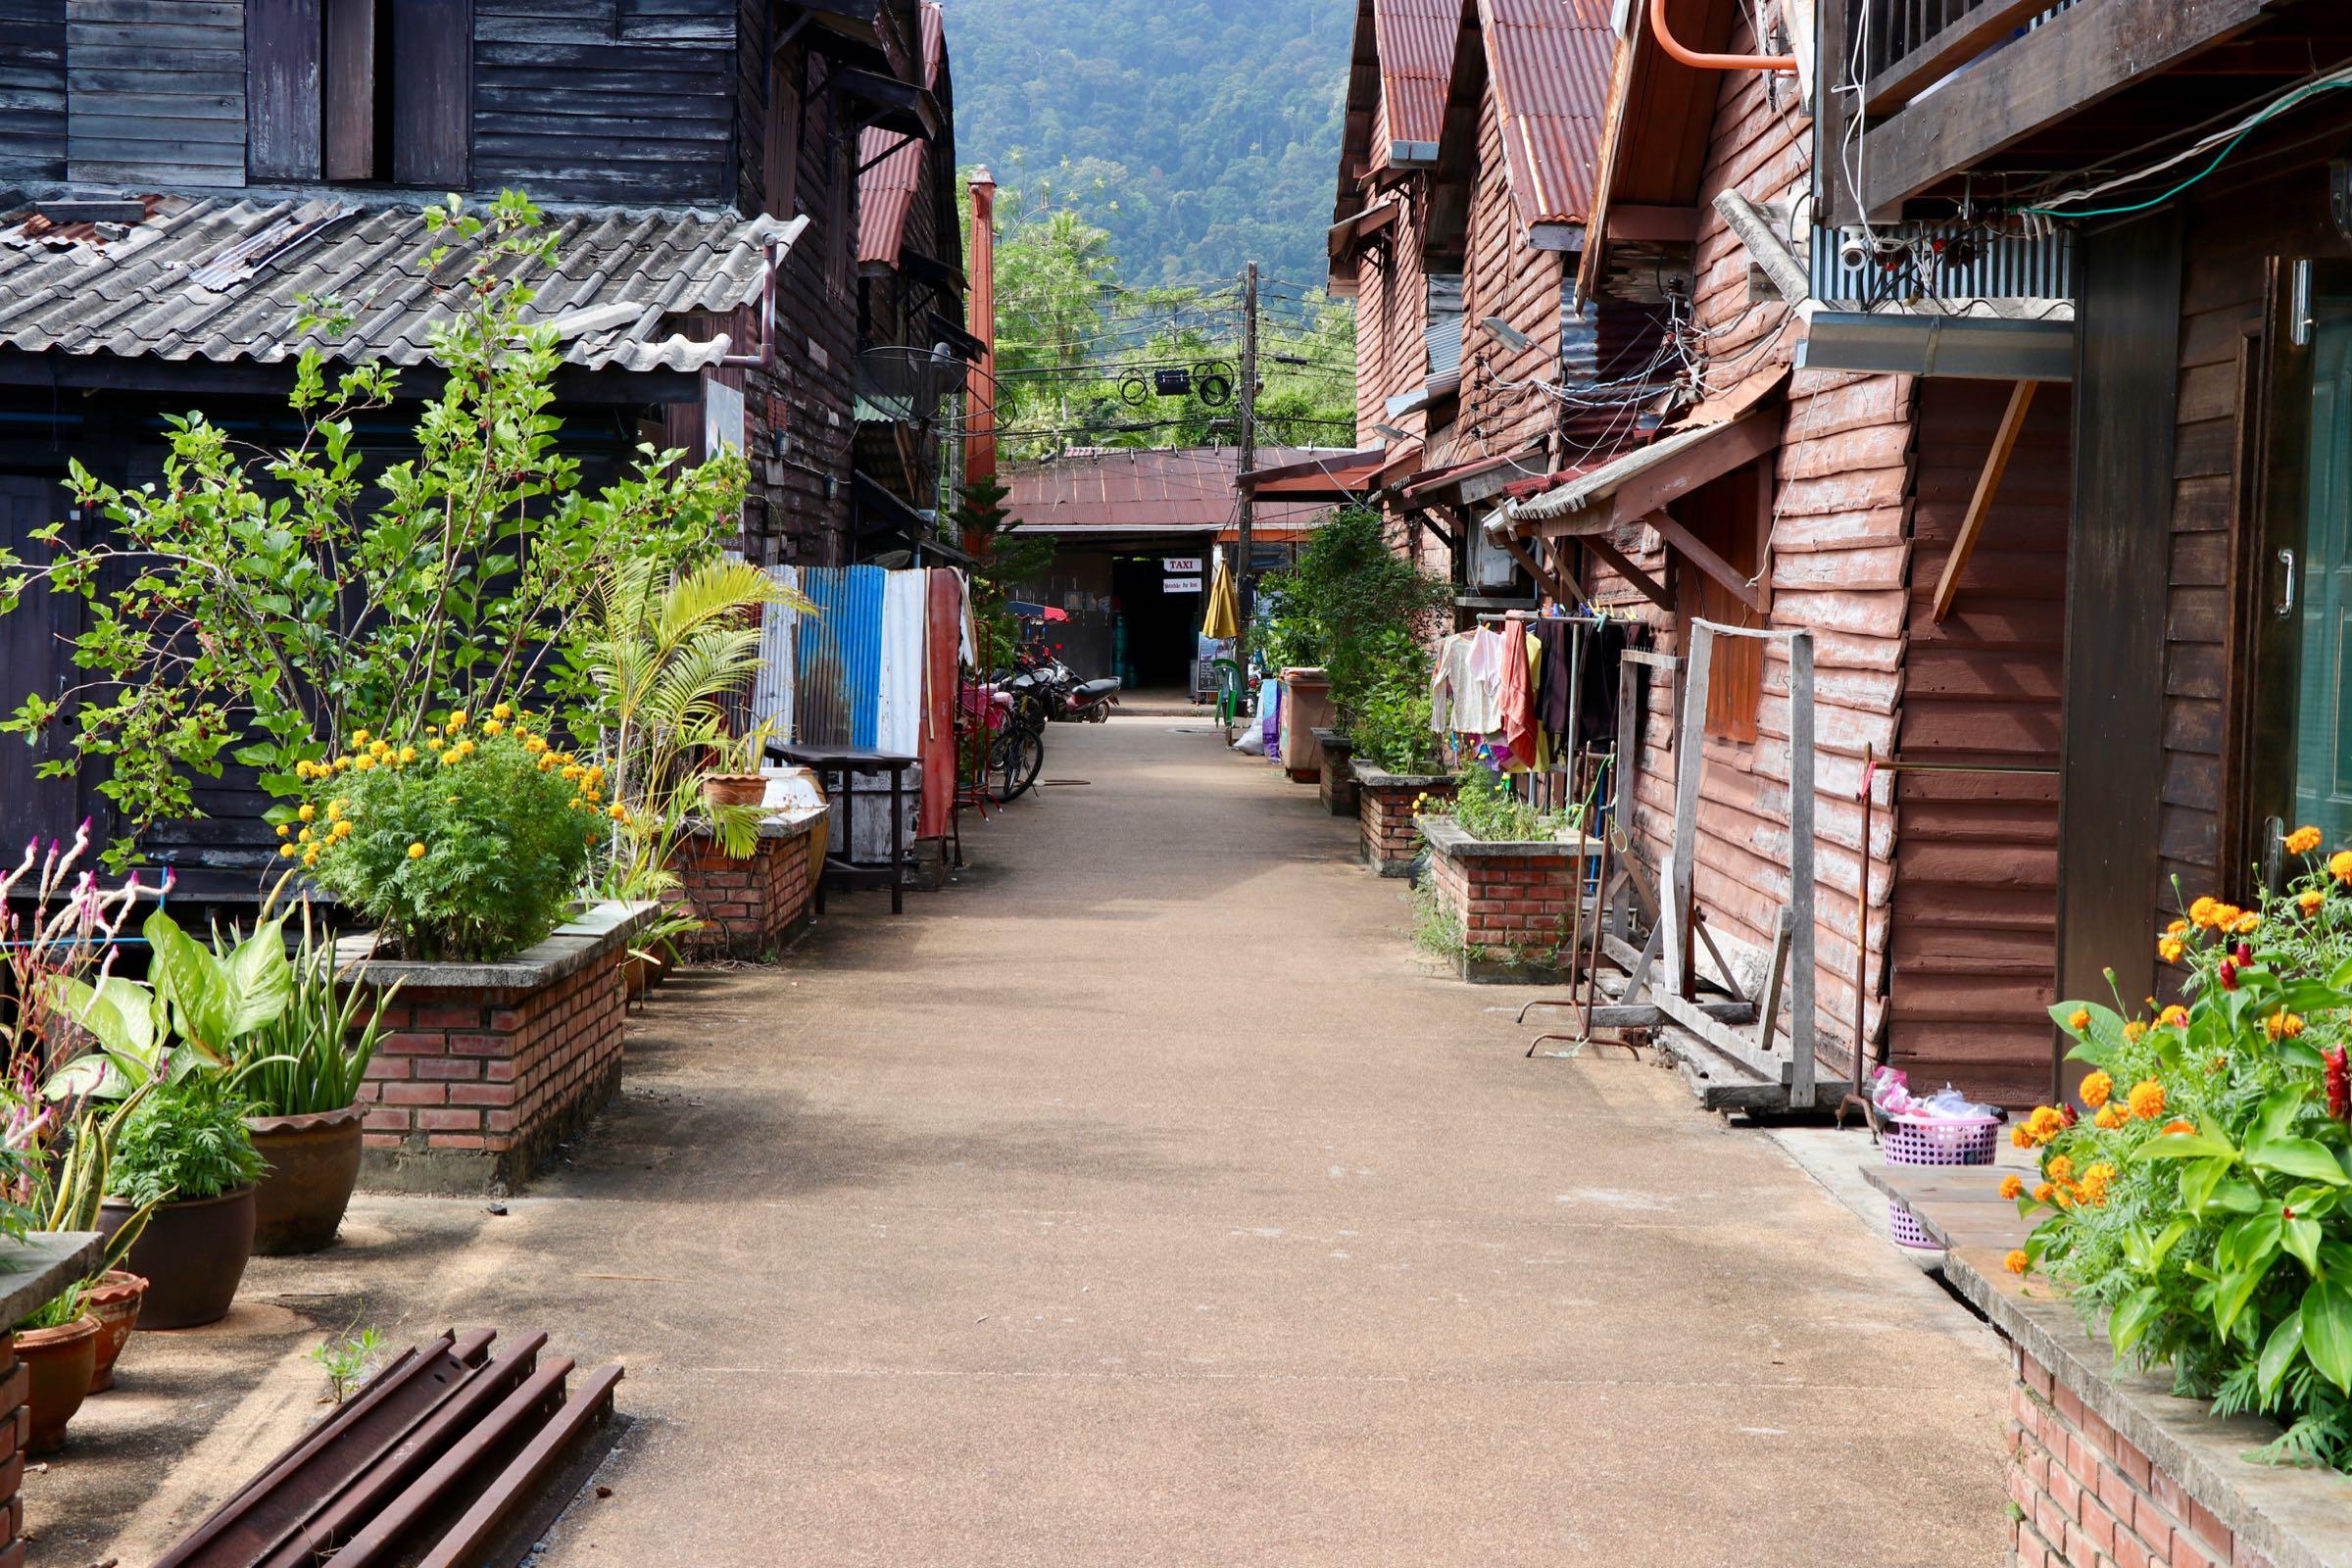 Häuser in Old Town, Ko Lanta Yai, Thailand